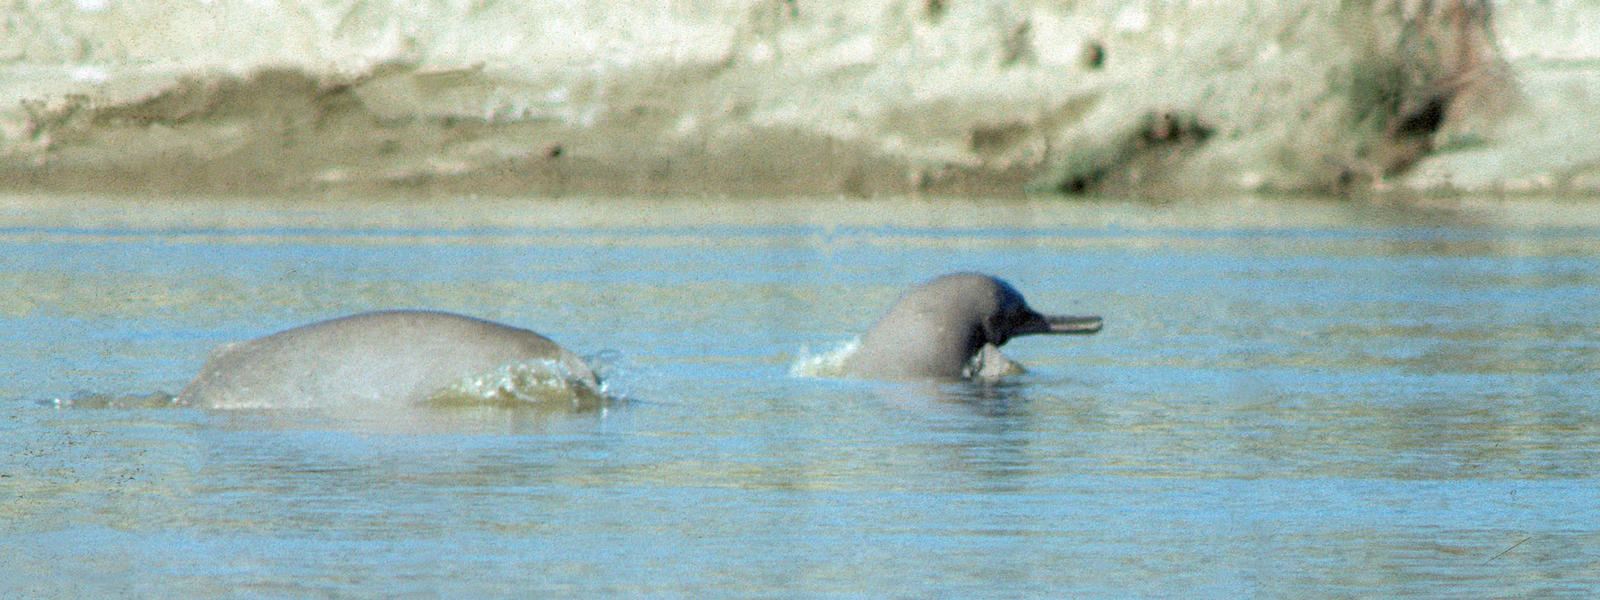 indus river dolphin species wwf